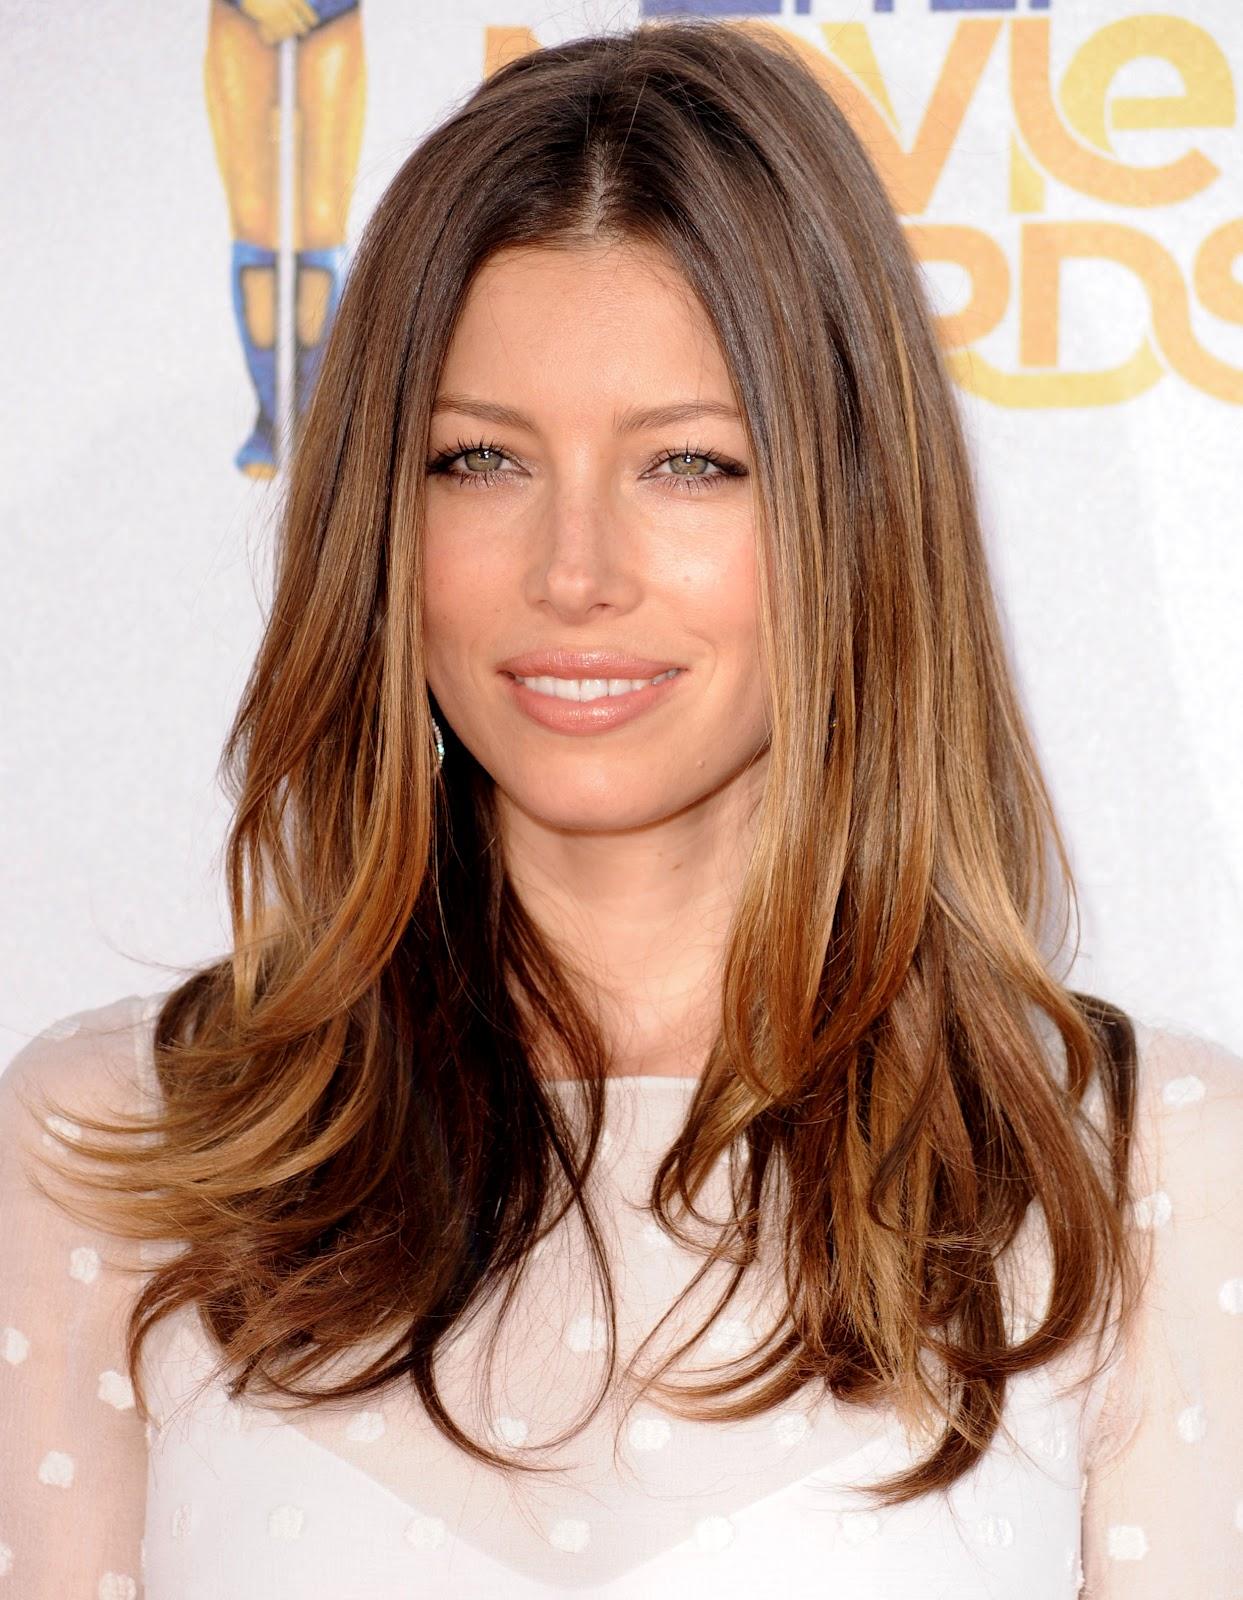 Stupendous Hairstyles Of Jessica Biel Film Actress Angled Bob Hairstyle Short Hairstyles Gunalazisus